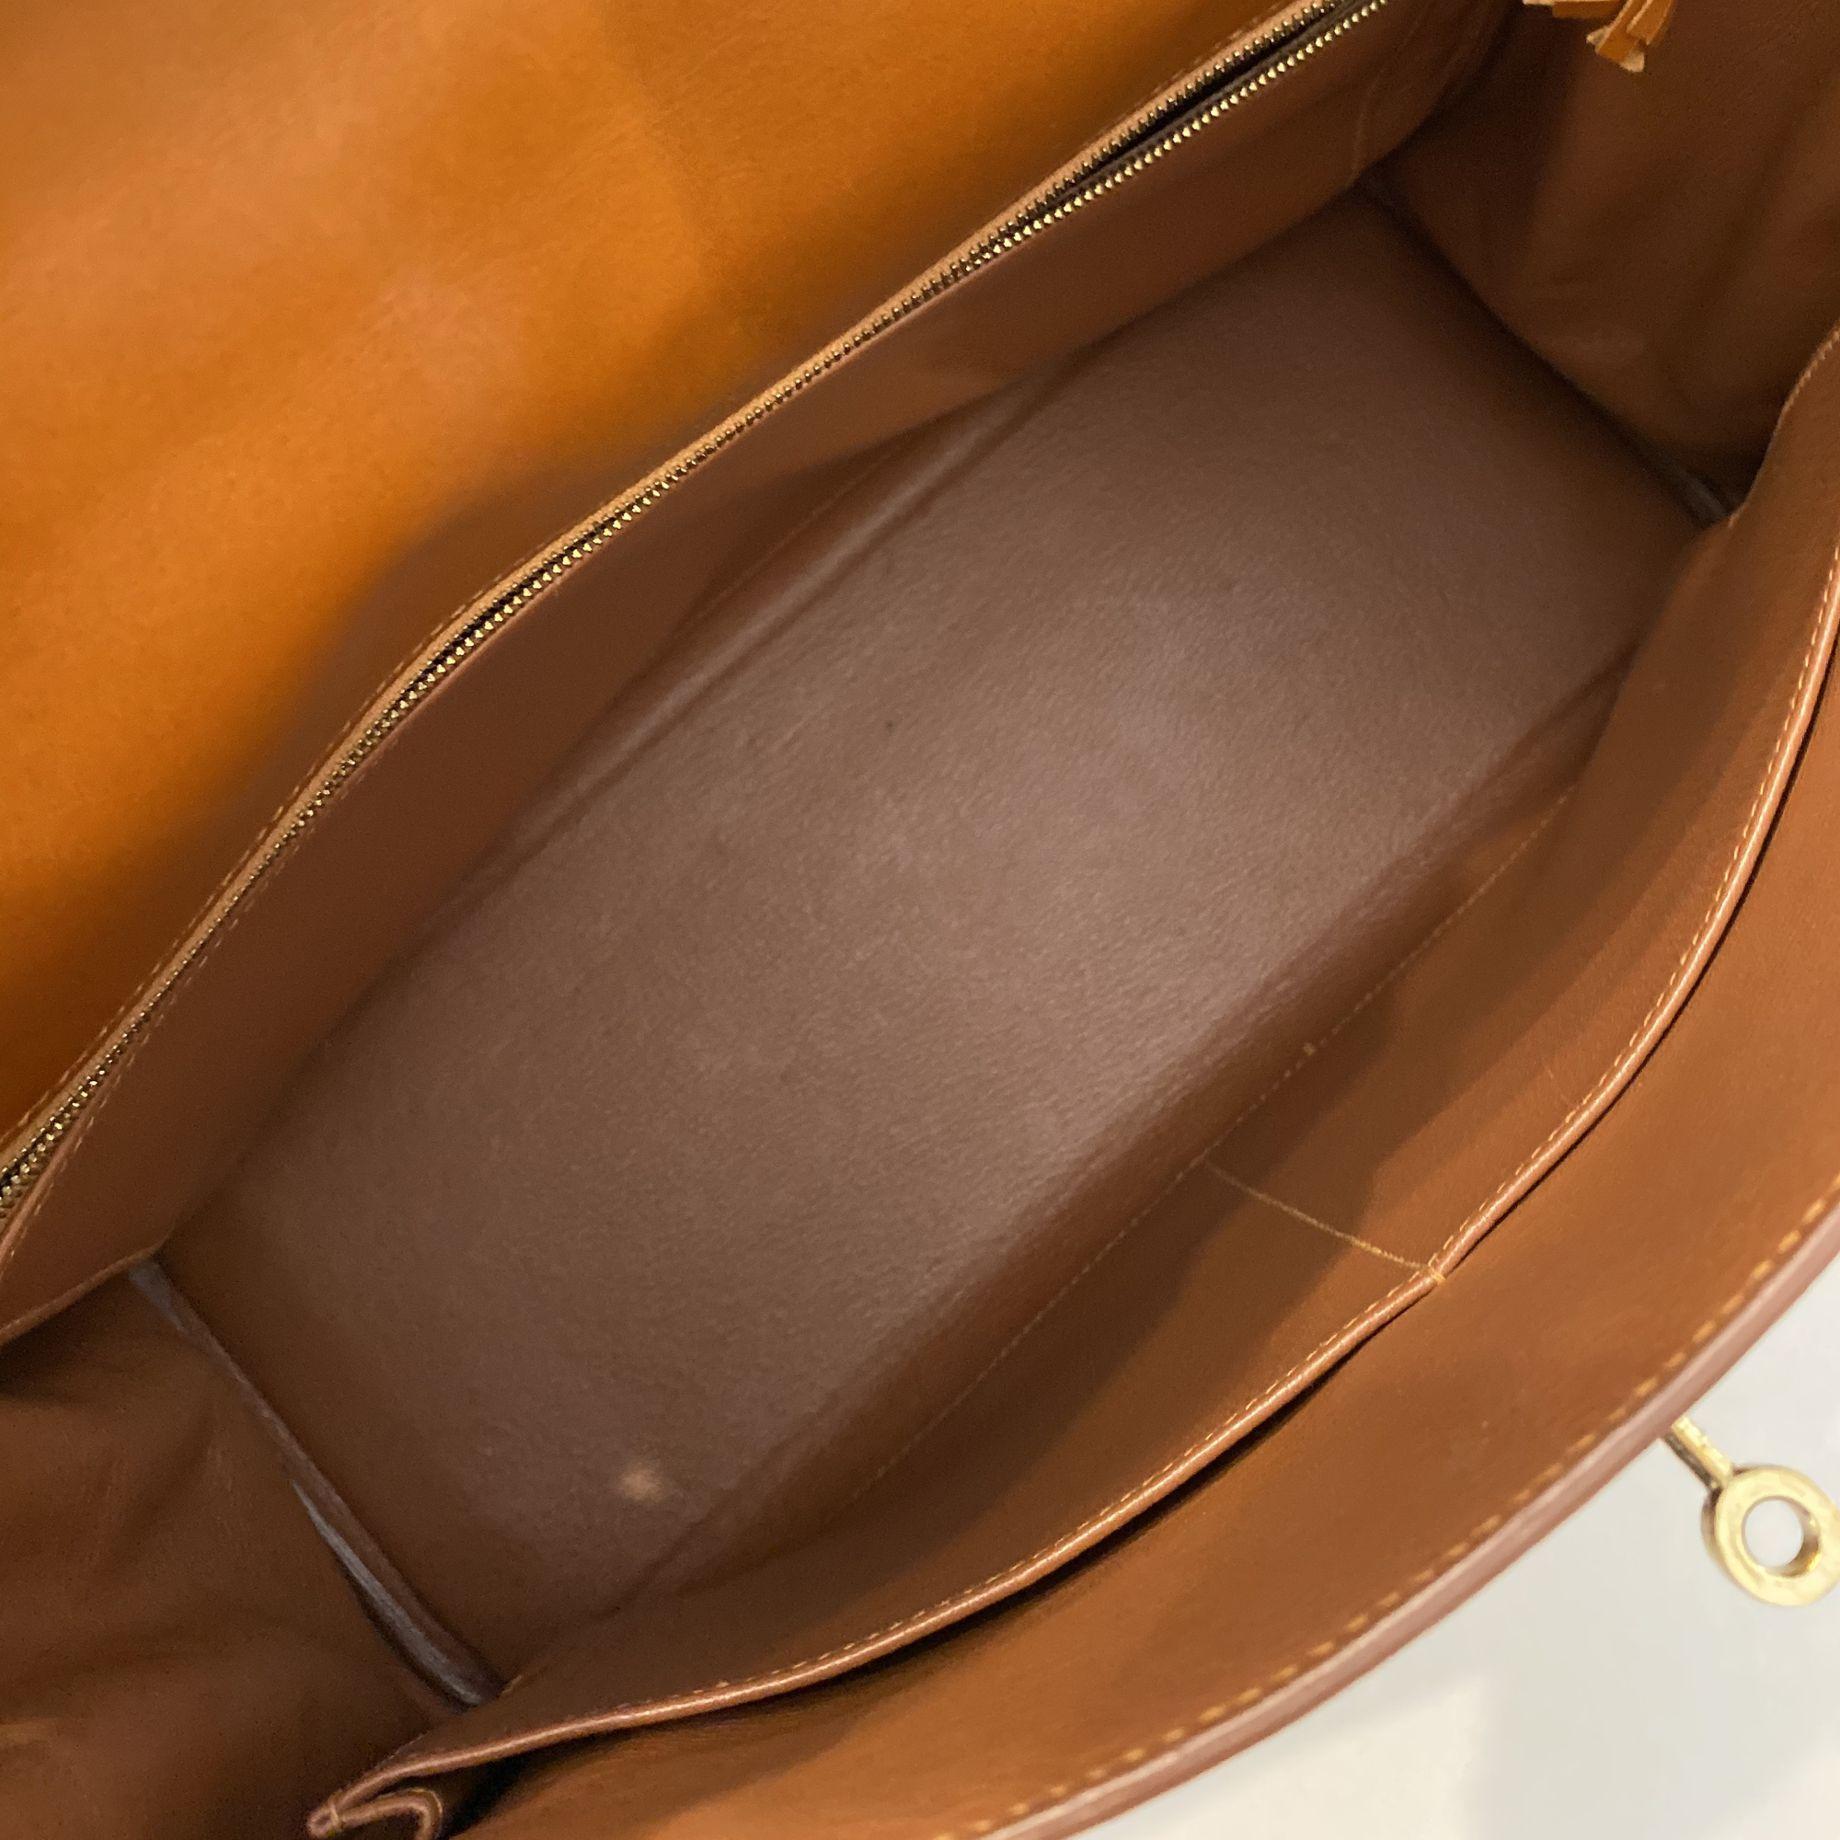 Bolsa Hermès Kelly 35 Selleria Caramelo